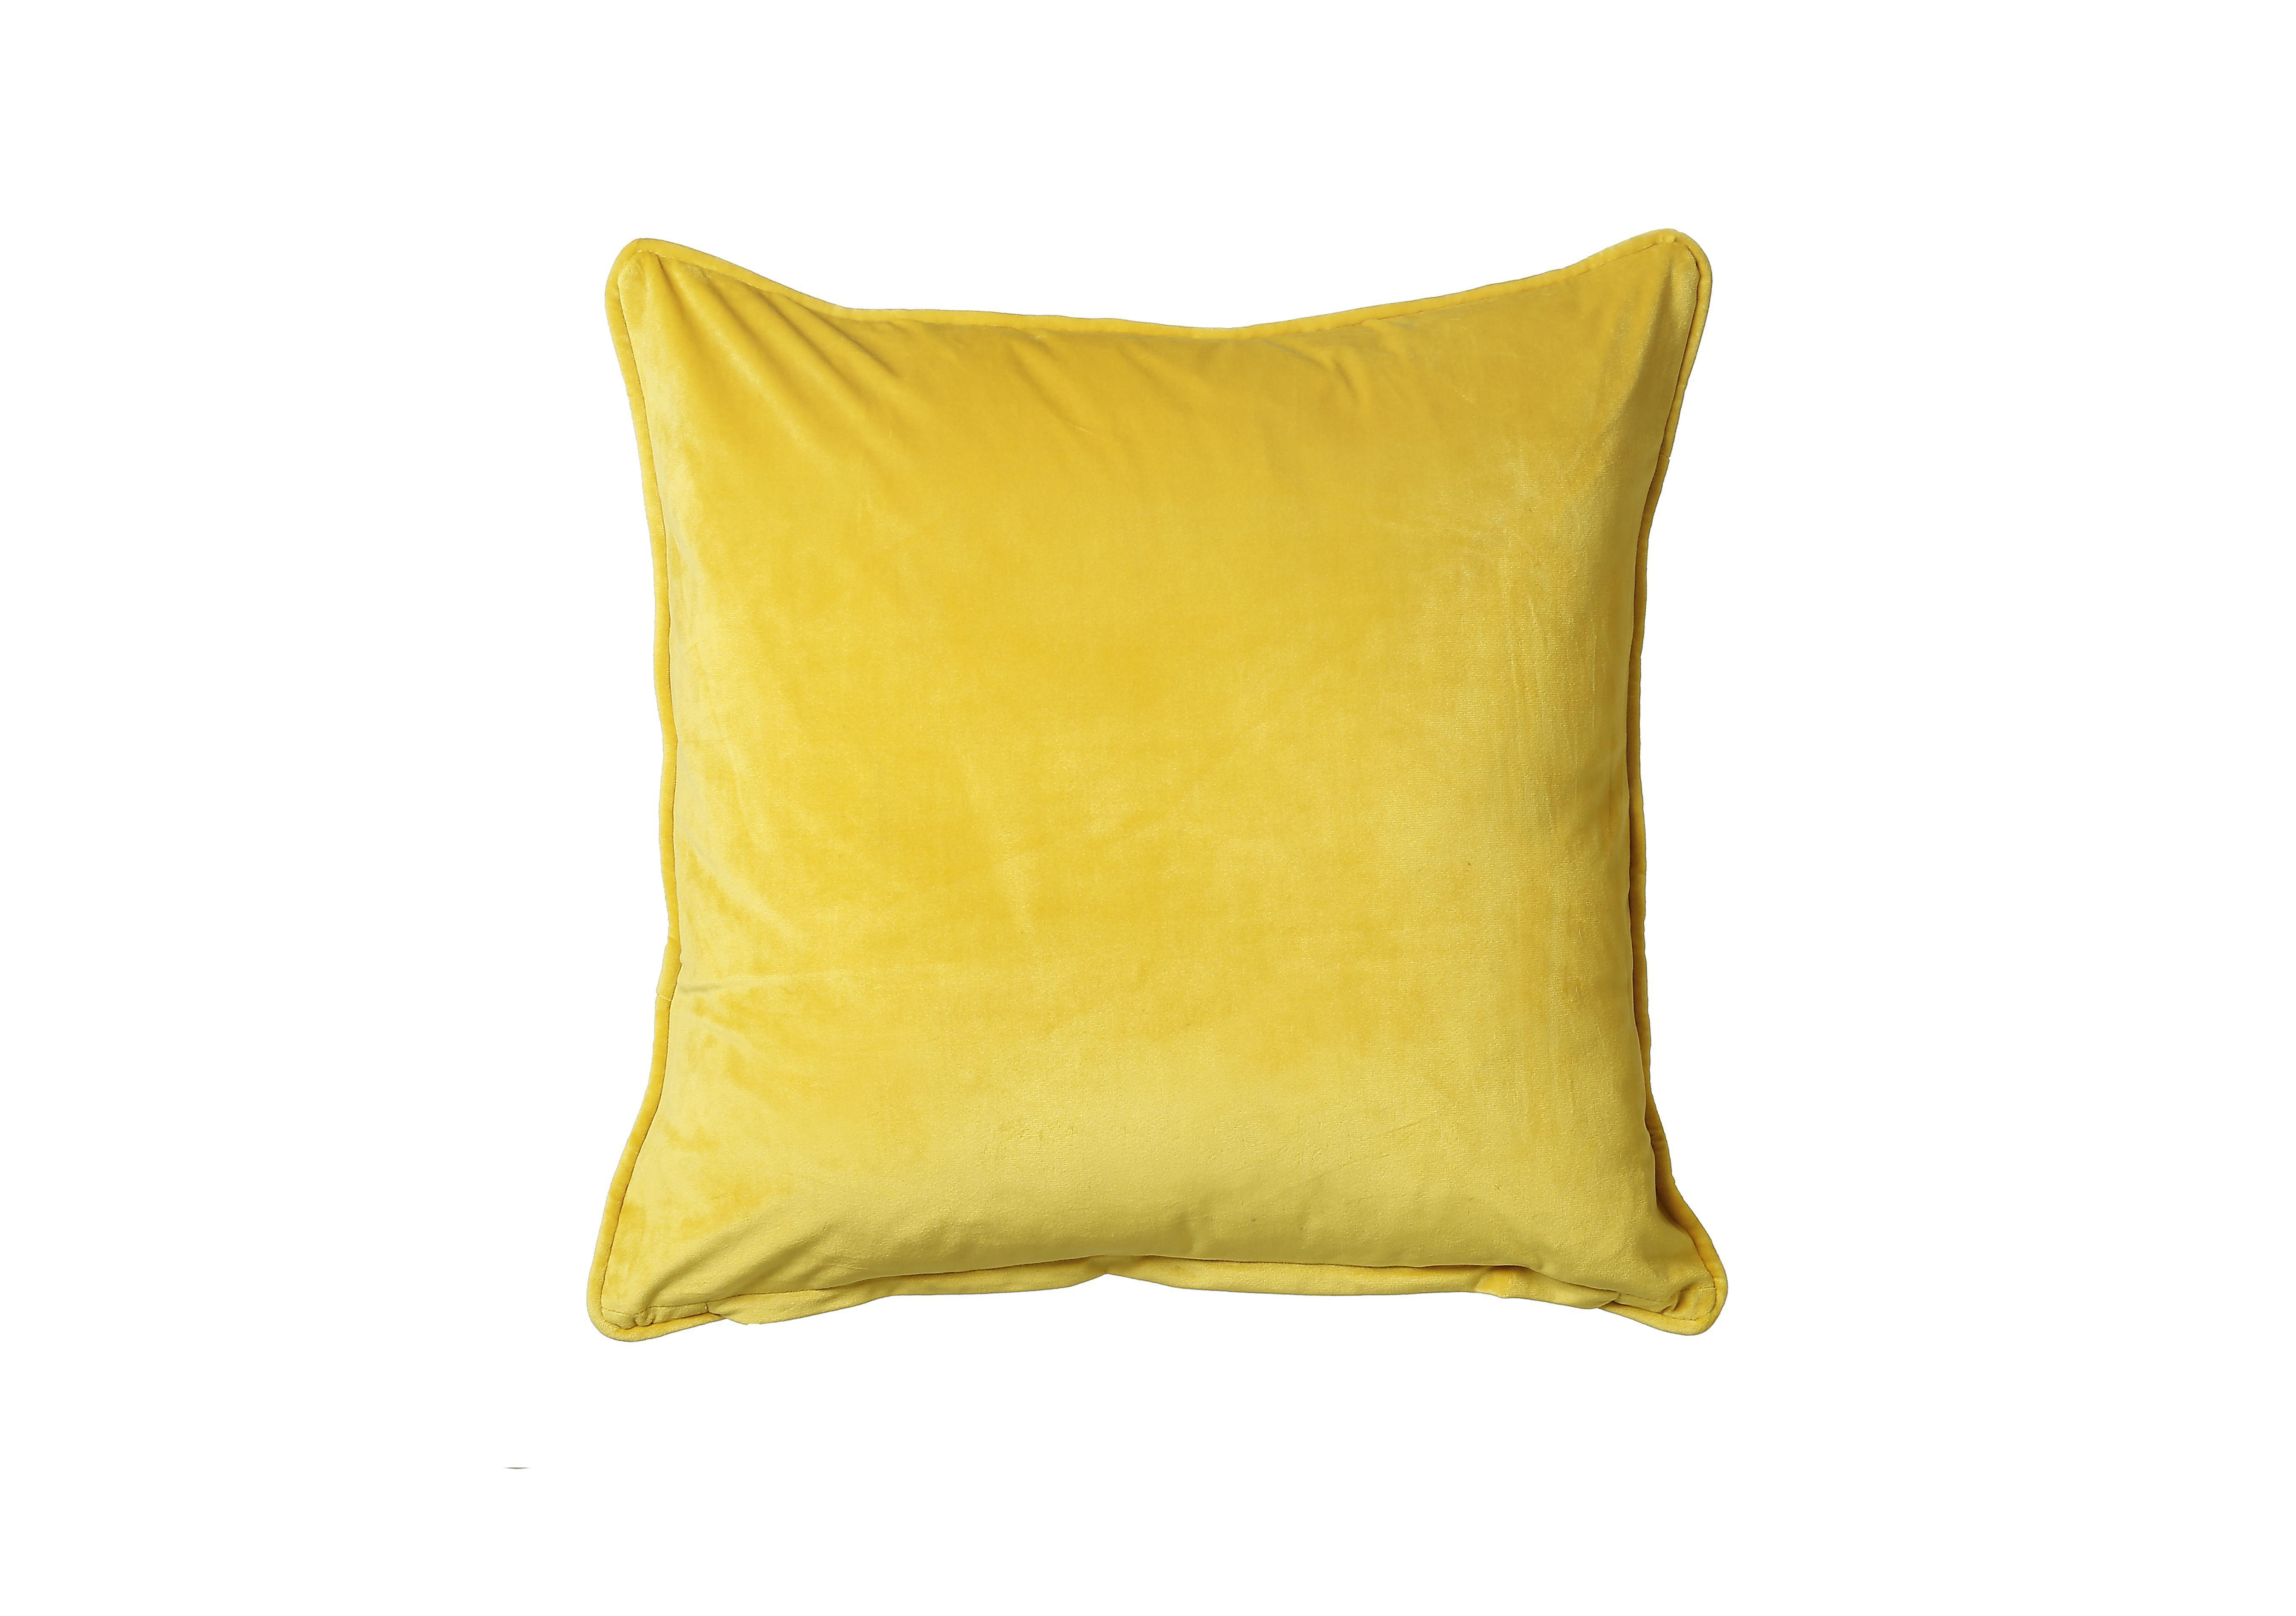 Beau Save £10. Corelli Velour Cushion